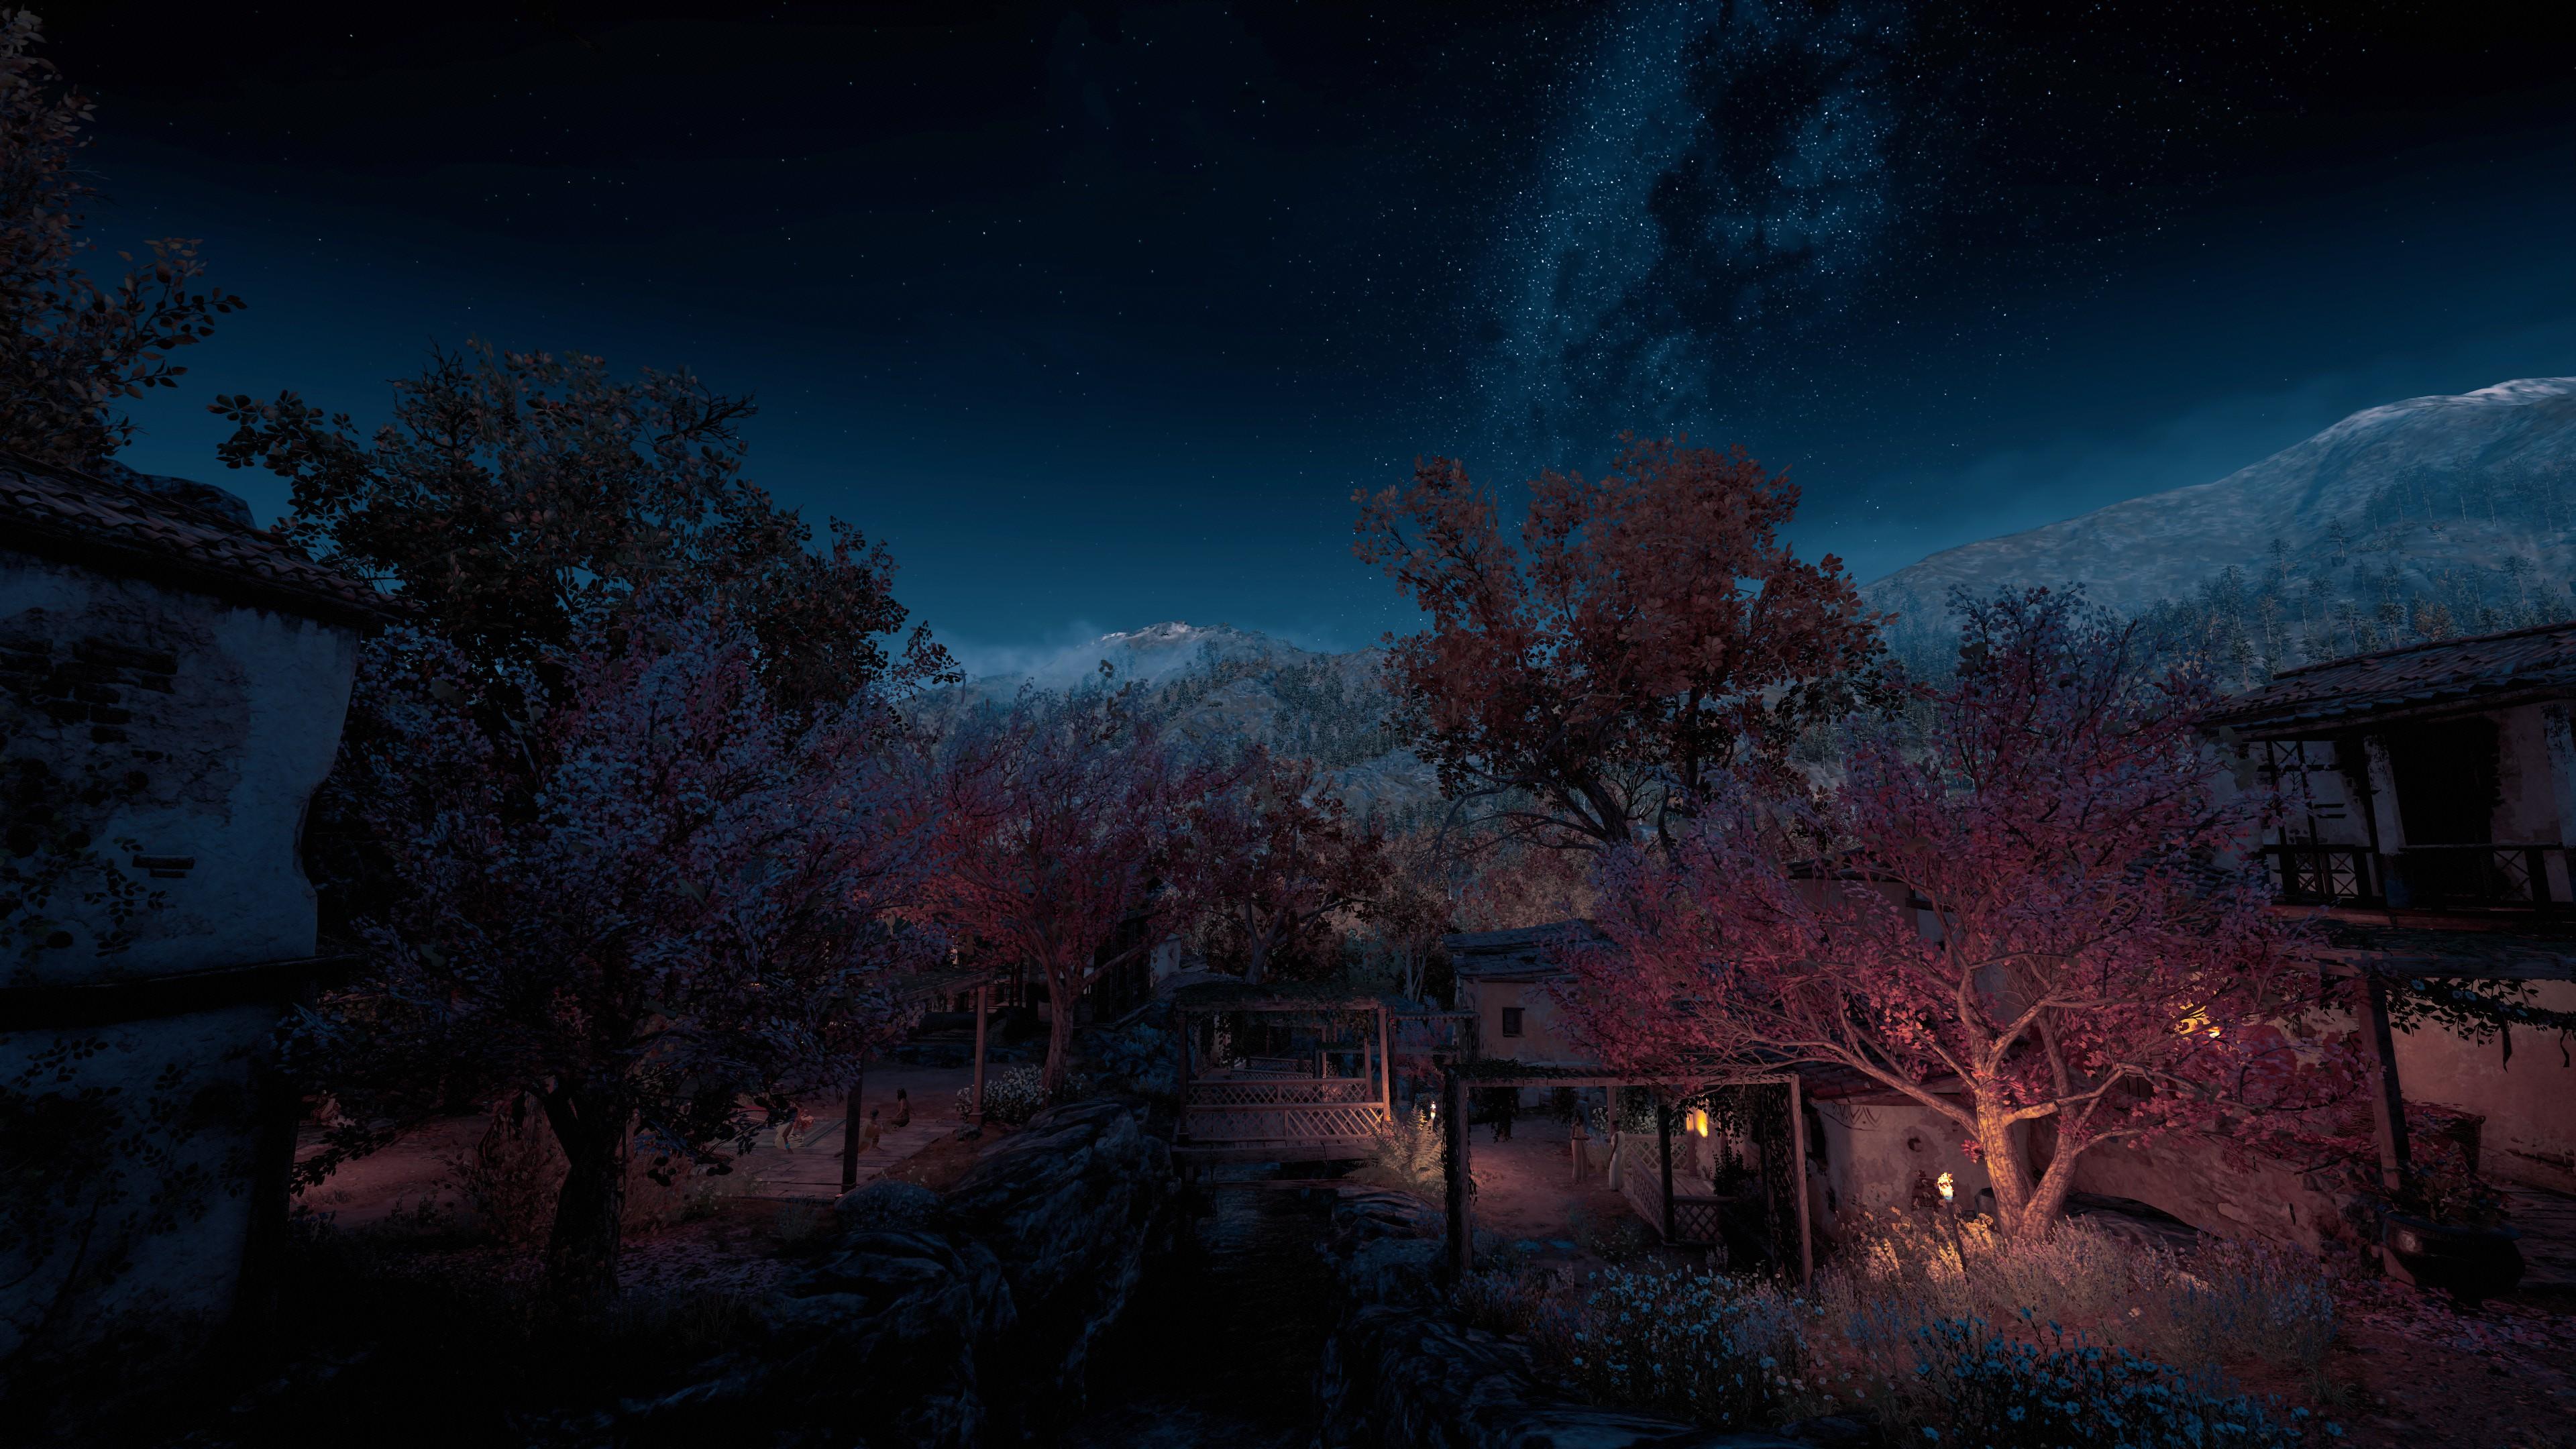 General 3840x2160 Assassins Creed: Odyssey screen shot Video Game Landscape night